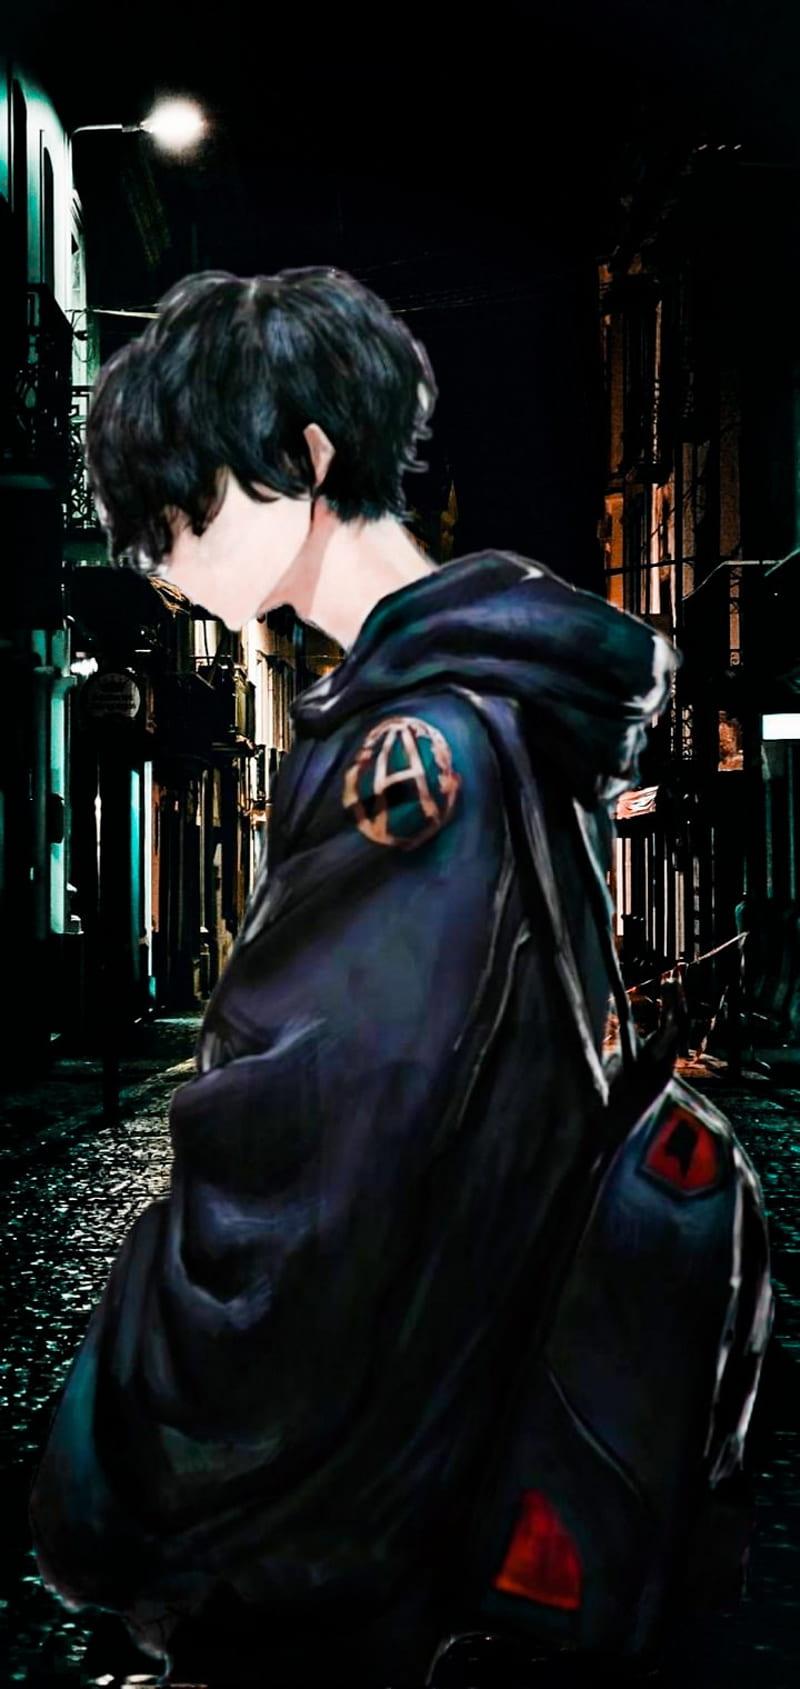 Anime Boy Bad Cartoon Cool Hd Mobile Wallpaper Peakpx